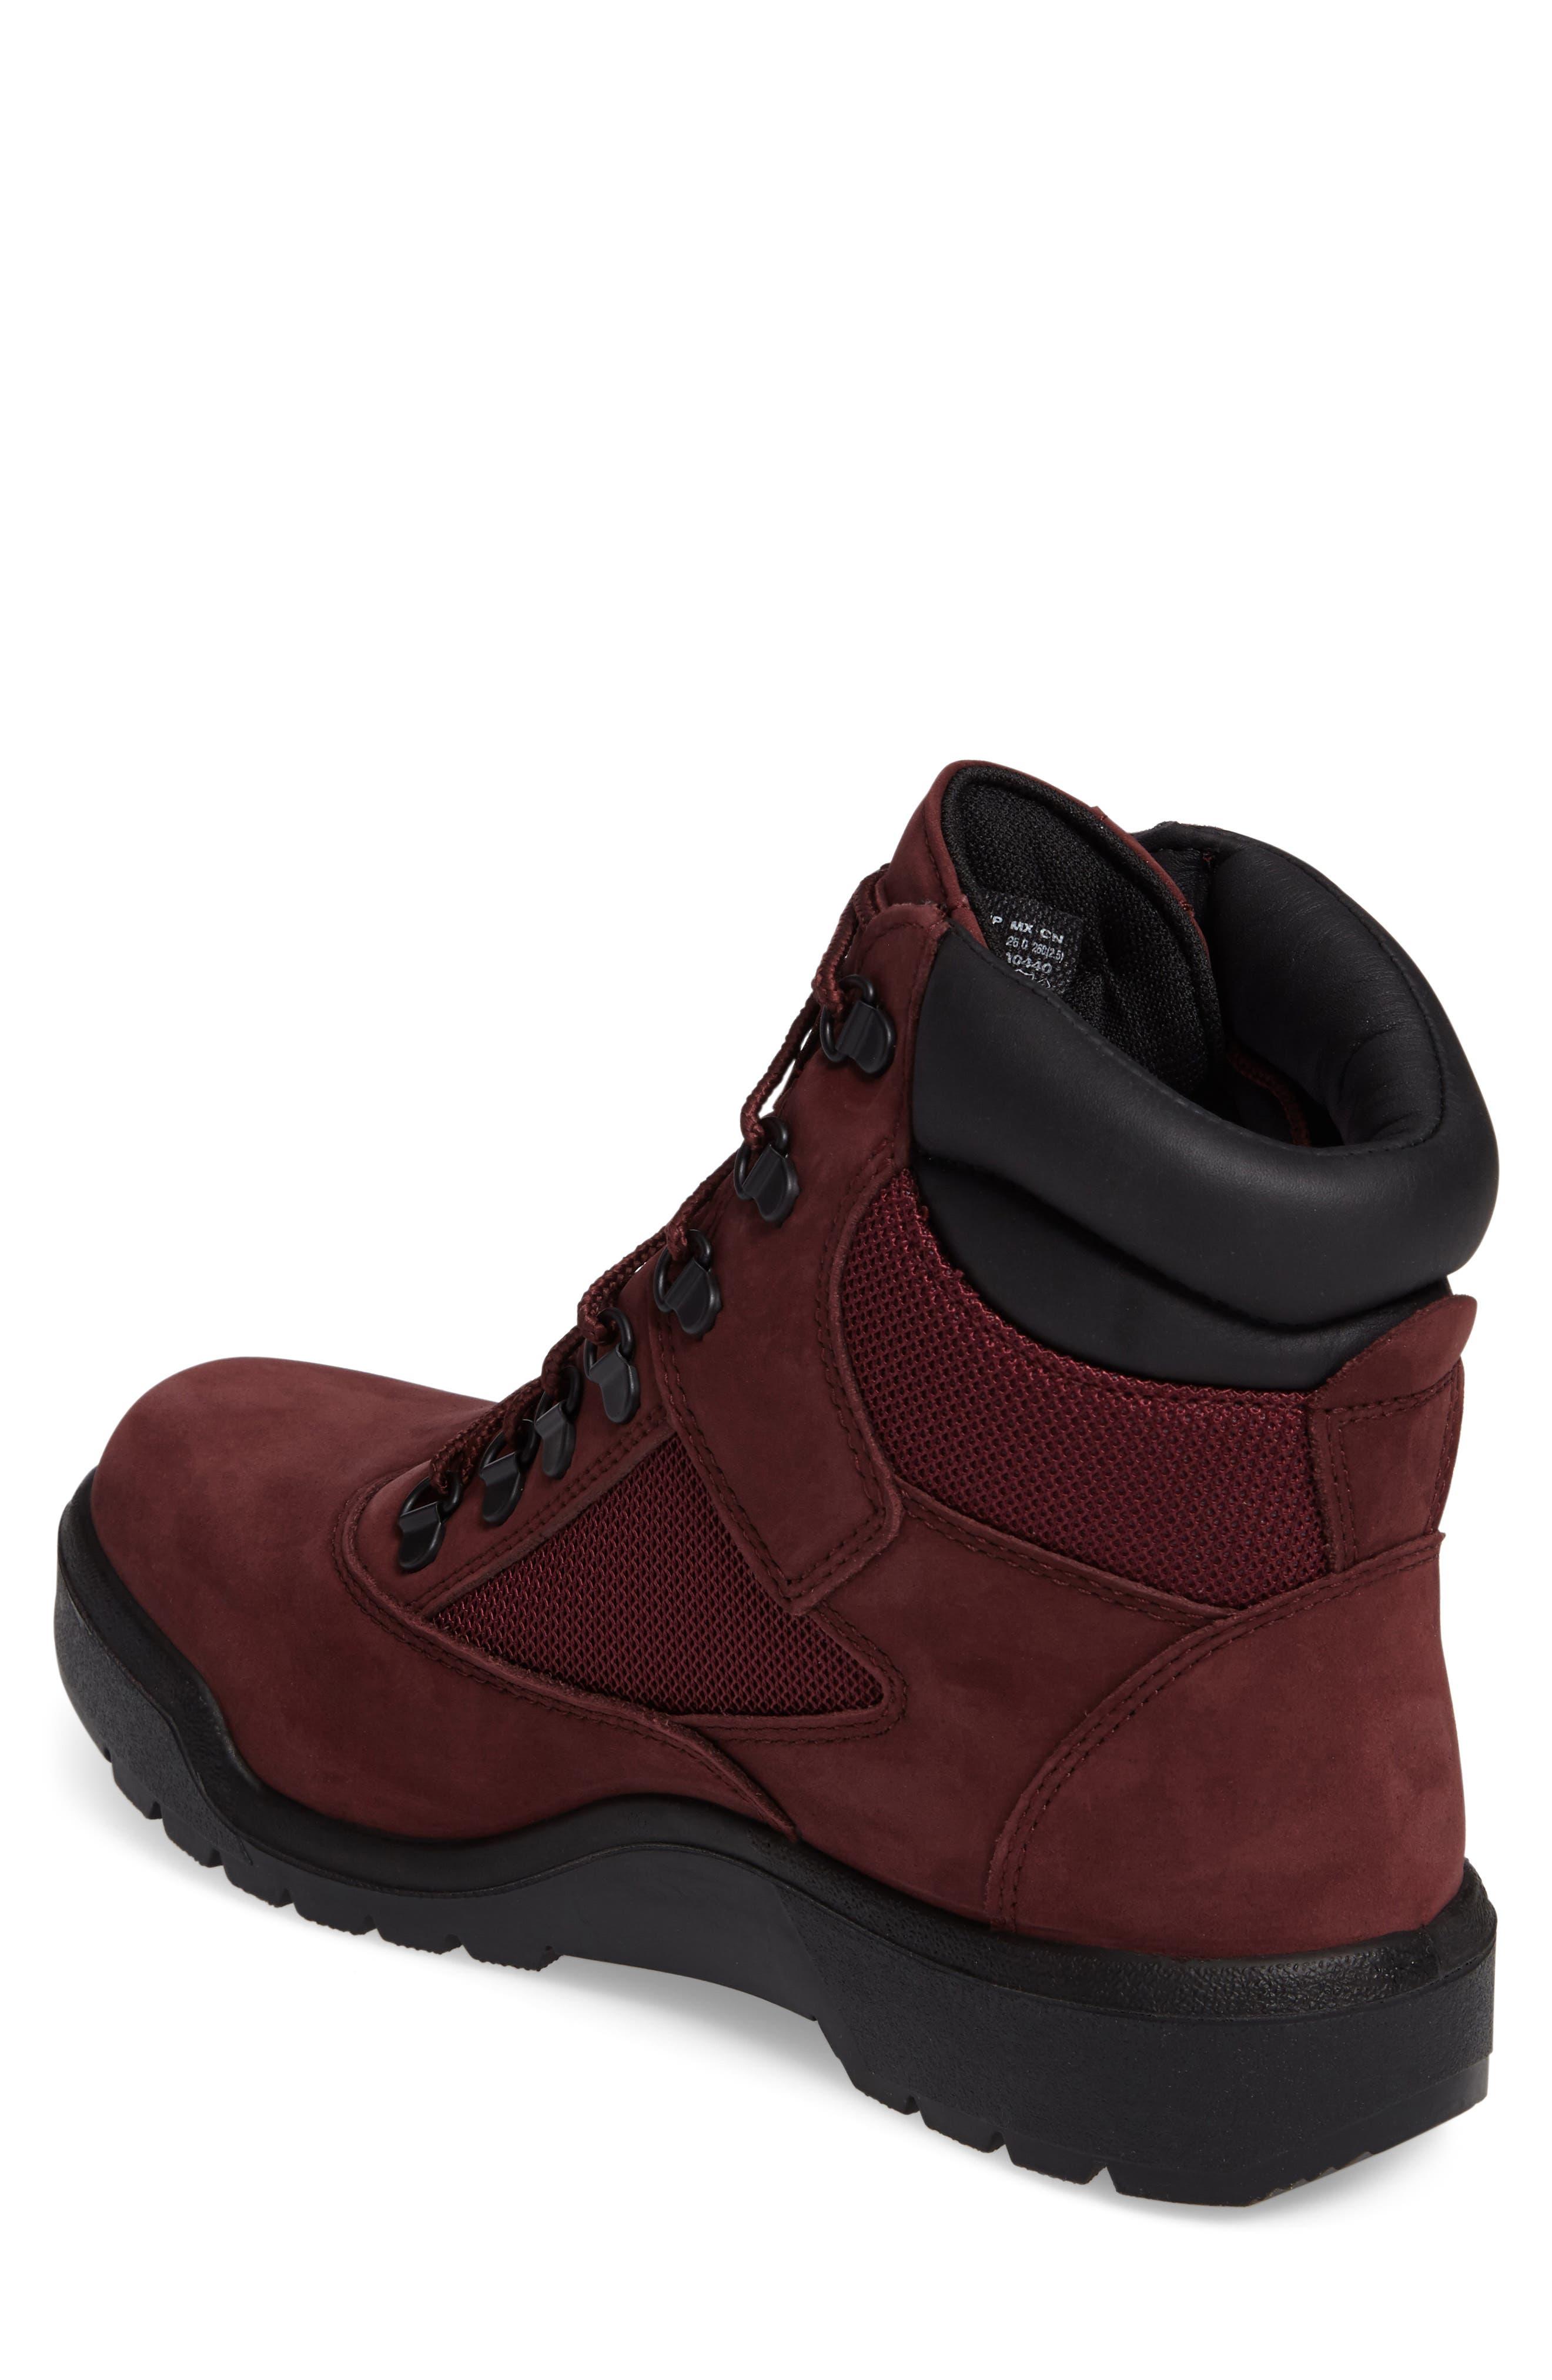 Field Waterproof Boot,                             Alternate thumbnail 20, color,